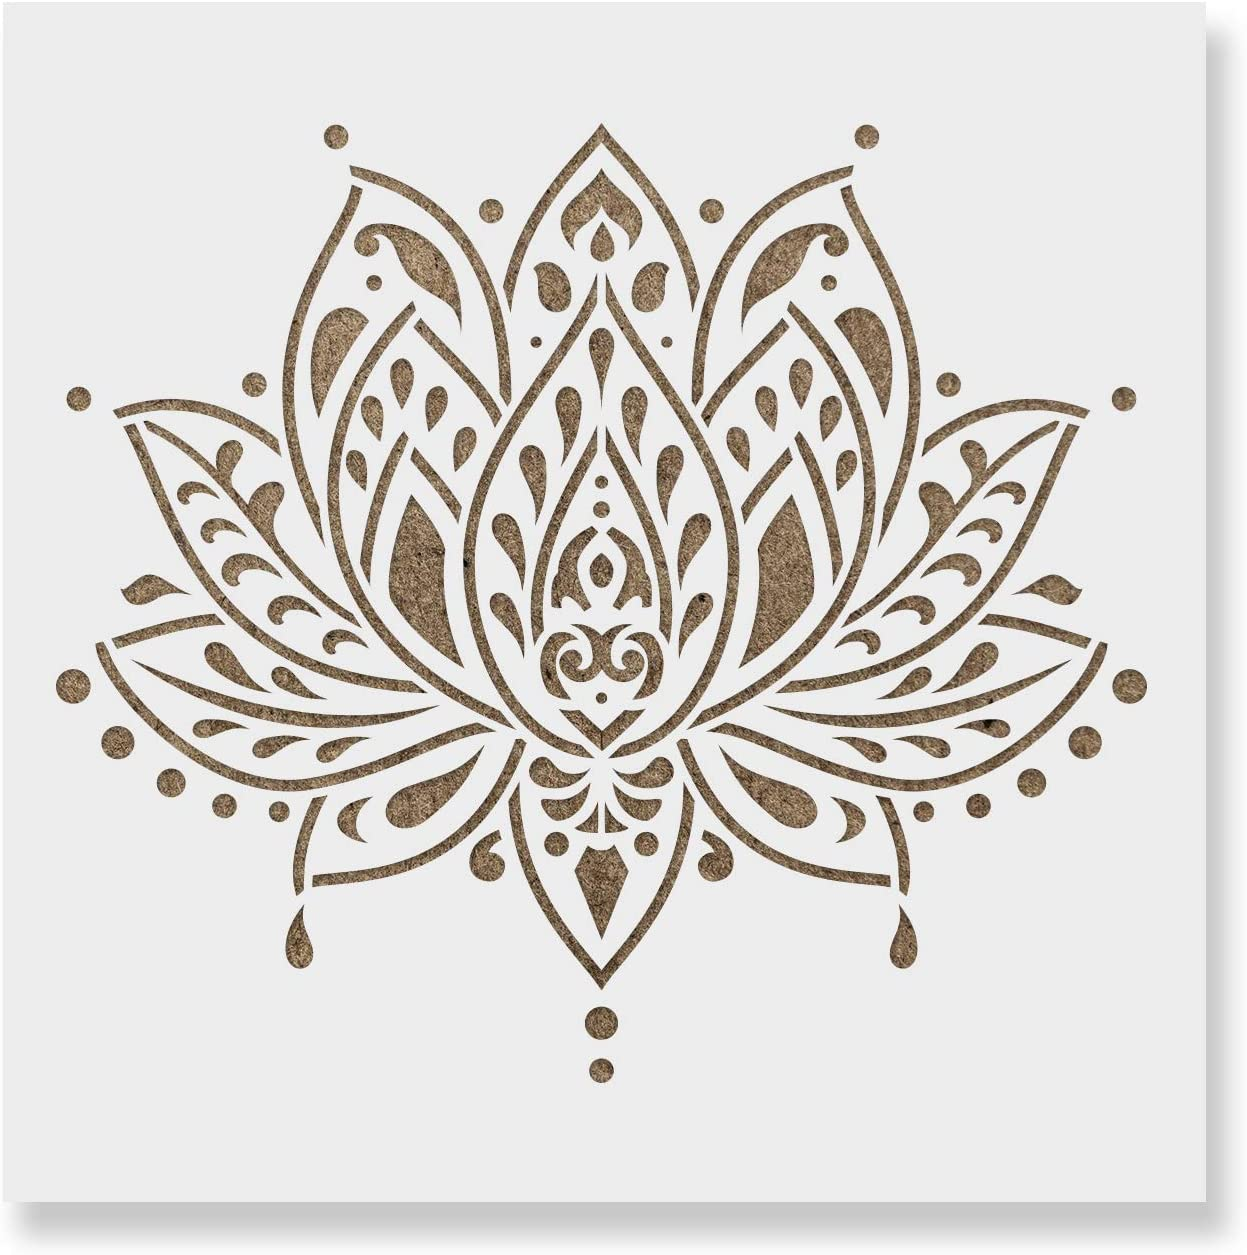 Flexible Stencil *LOTUS FLOWER* Design # 2 Pond Card Making Crafts 14cm x 14cm